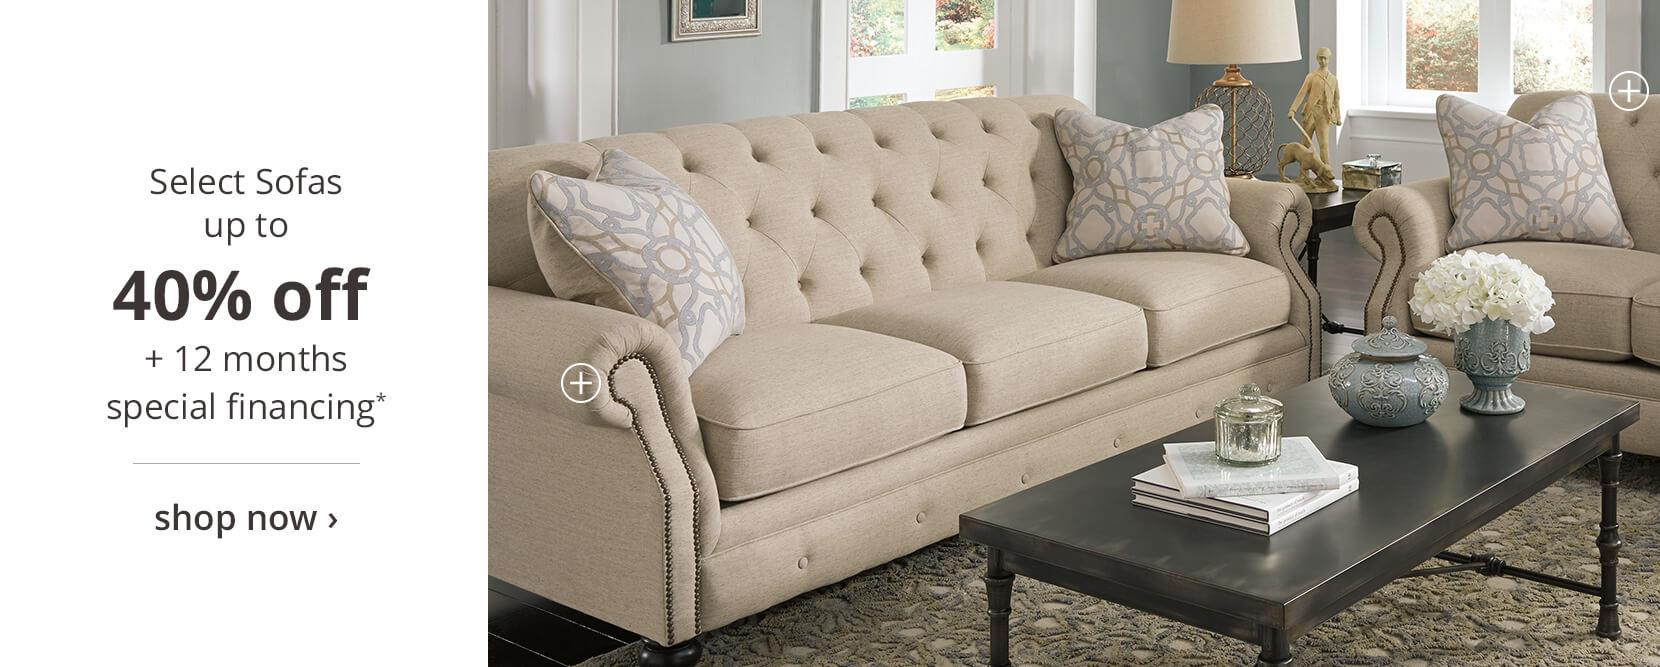 Ashley Furniture HomeStore Sofas